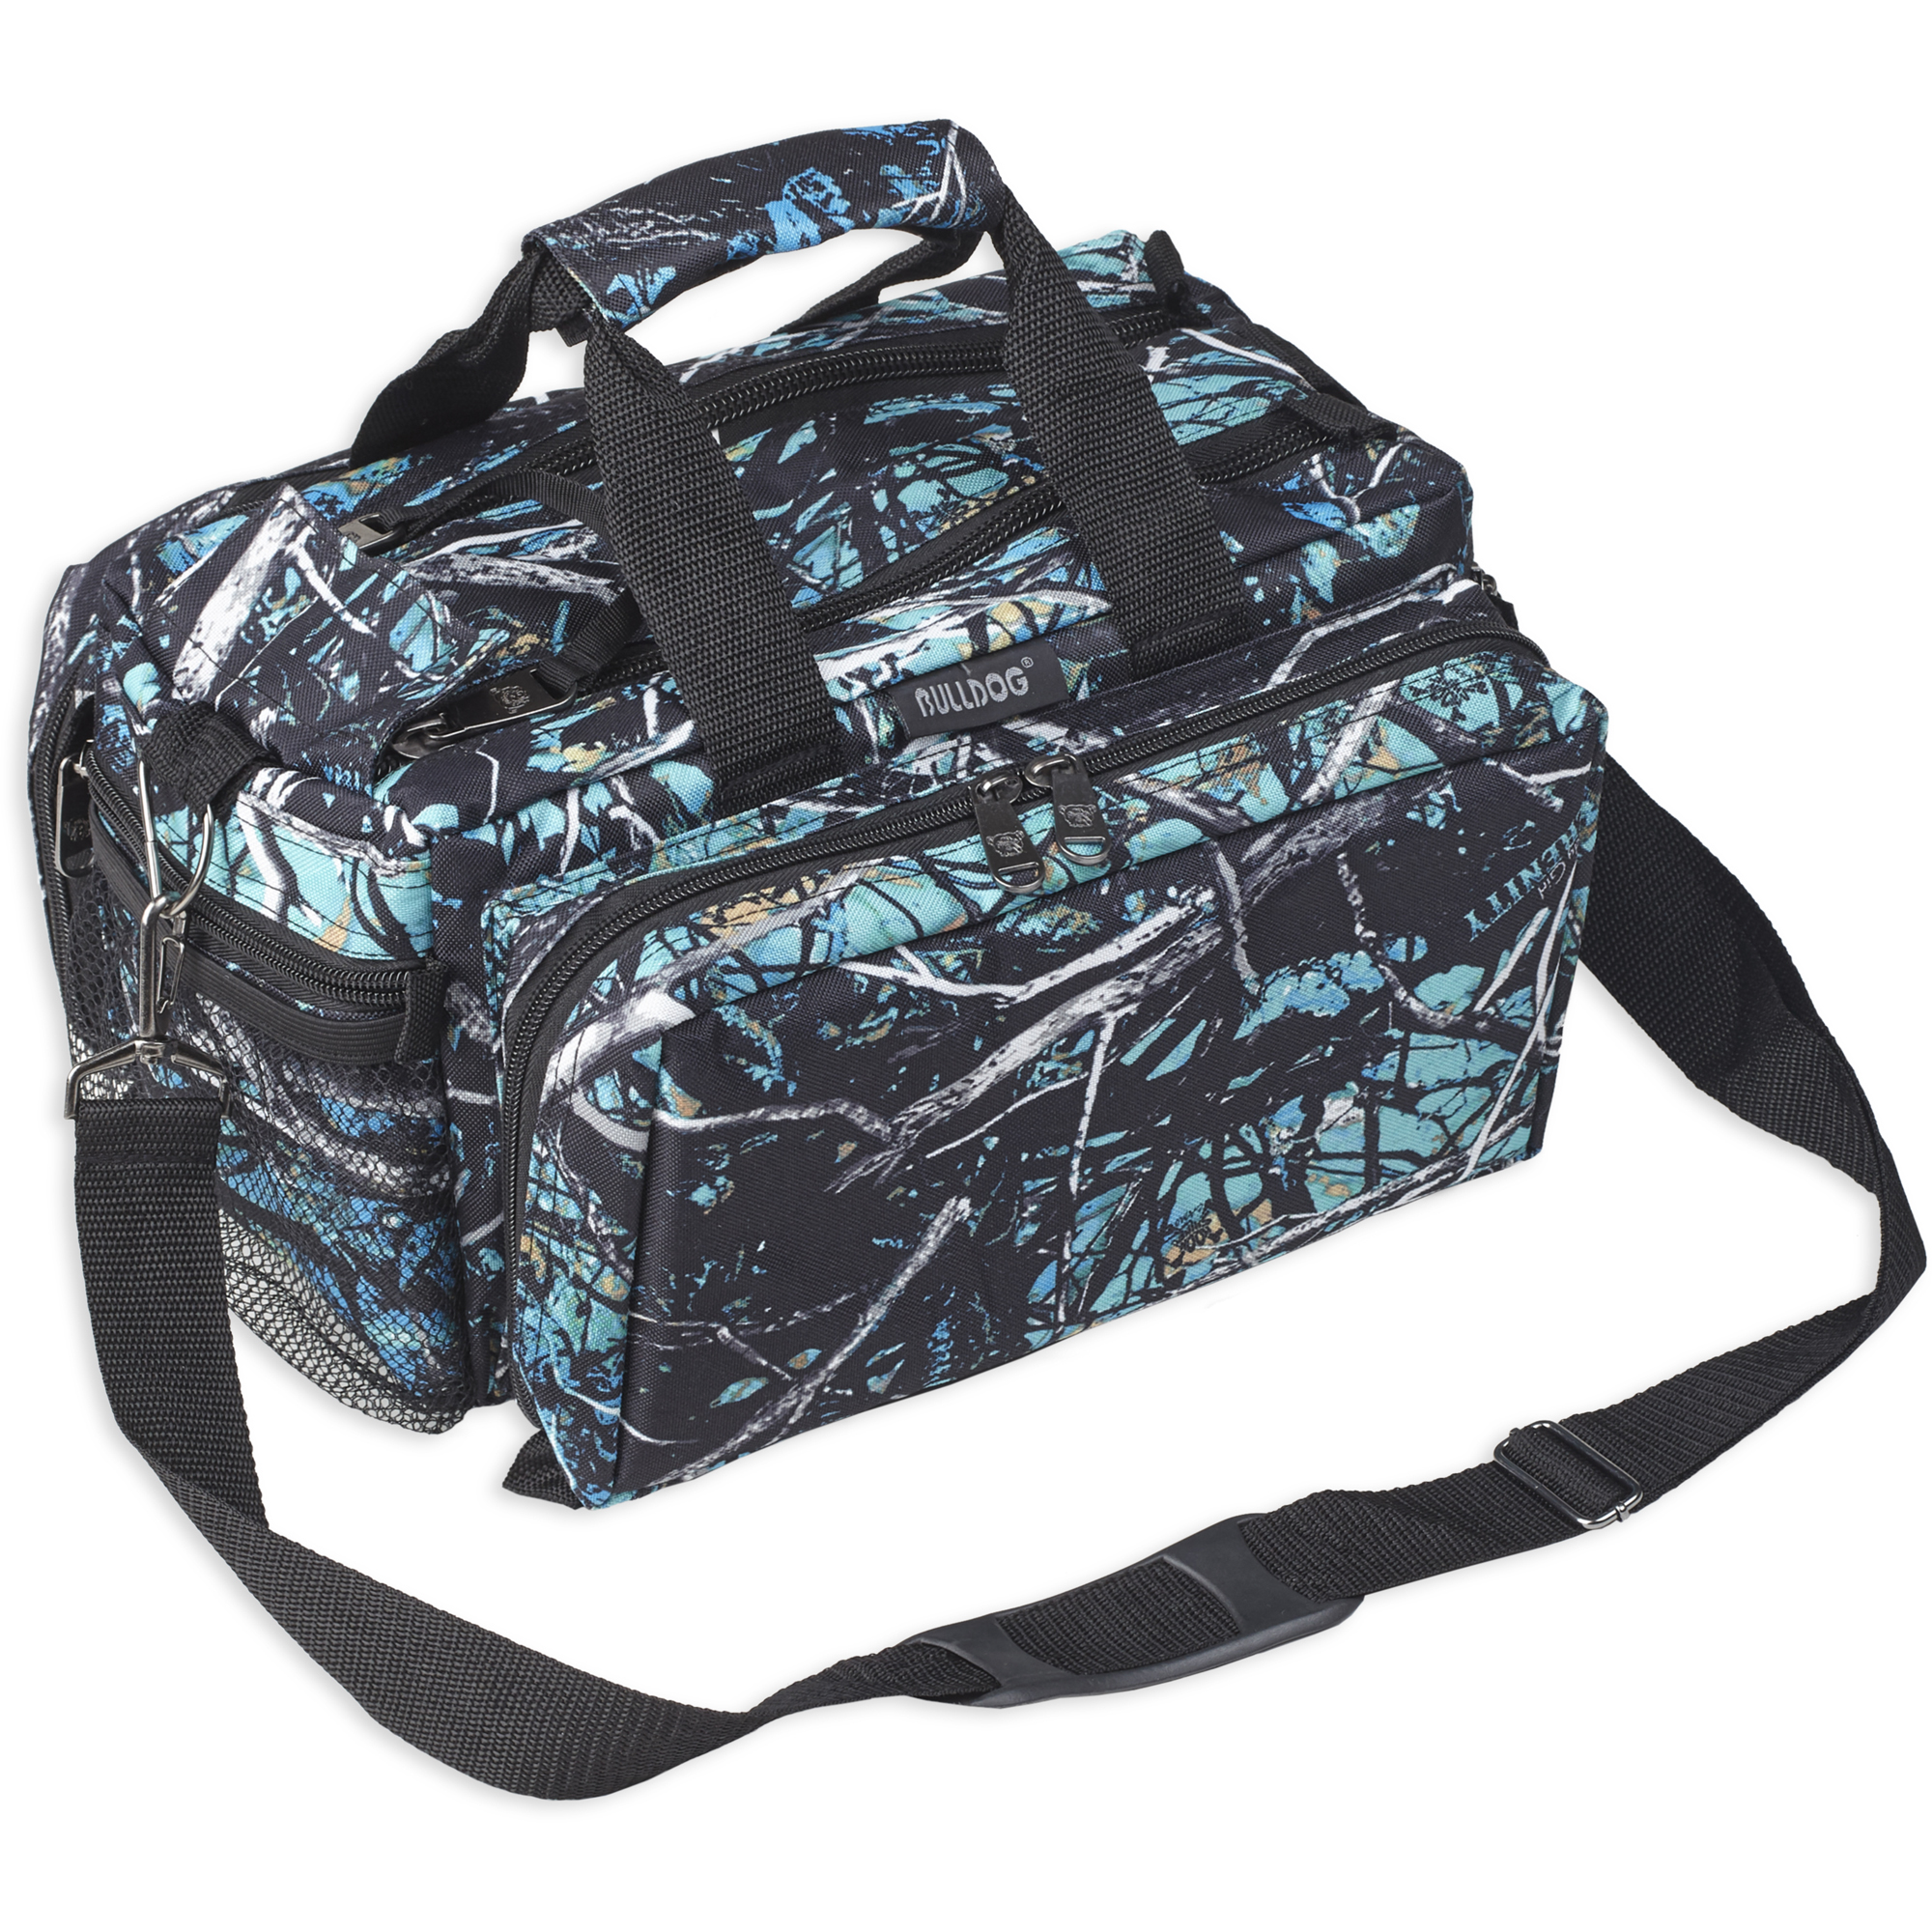 Bulldog Deluxe Seren Camo Range Bag